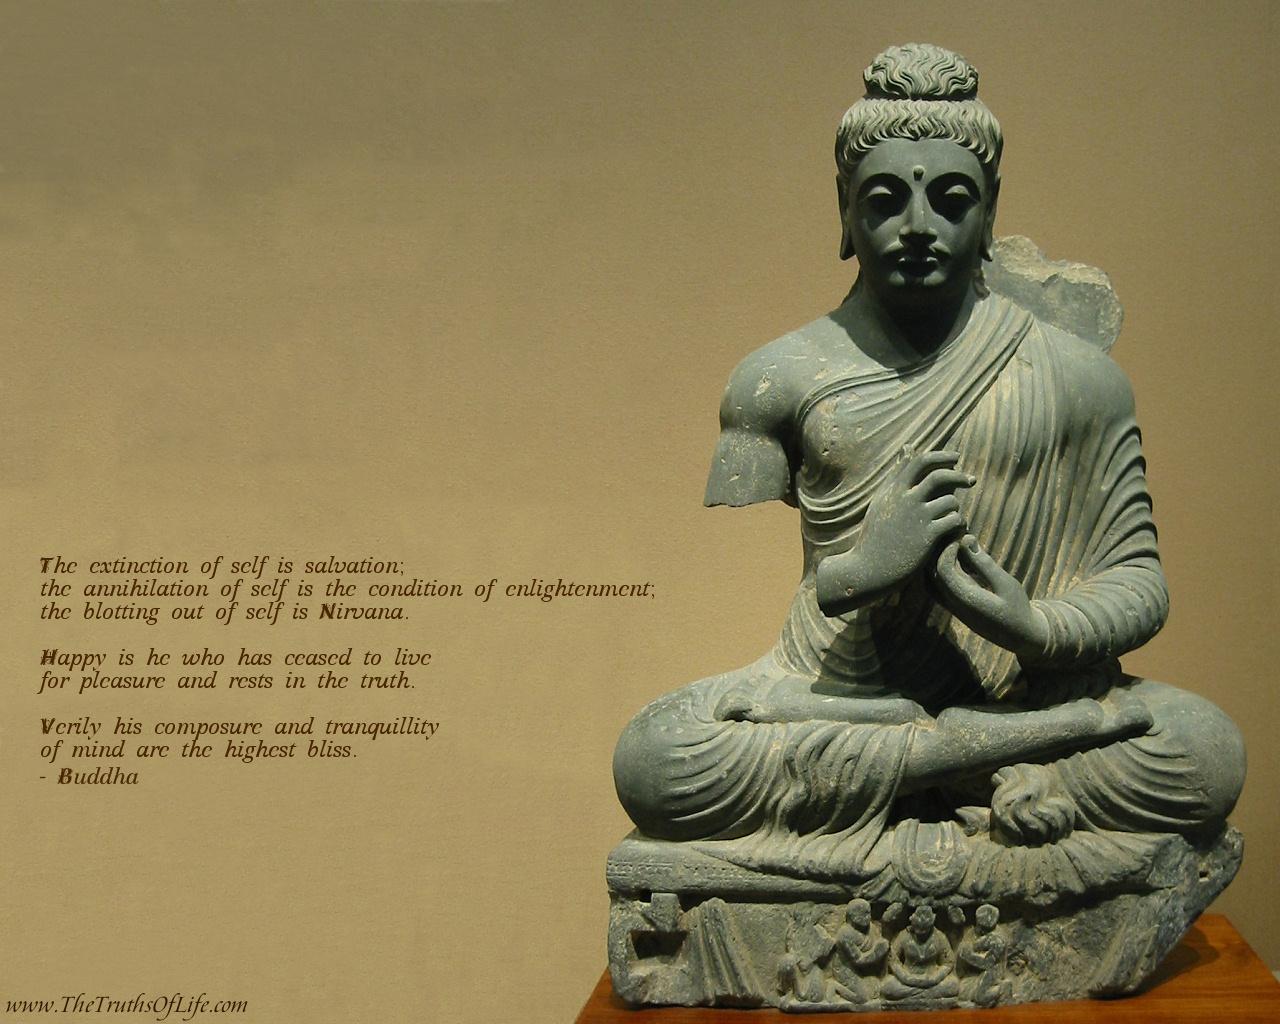 Buddha Statue Wallpaper 1280x1024 Buddha Statue Seated 1280x1024 1280x1024